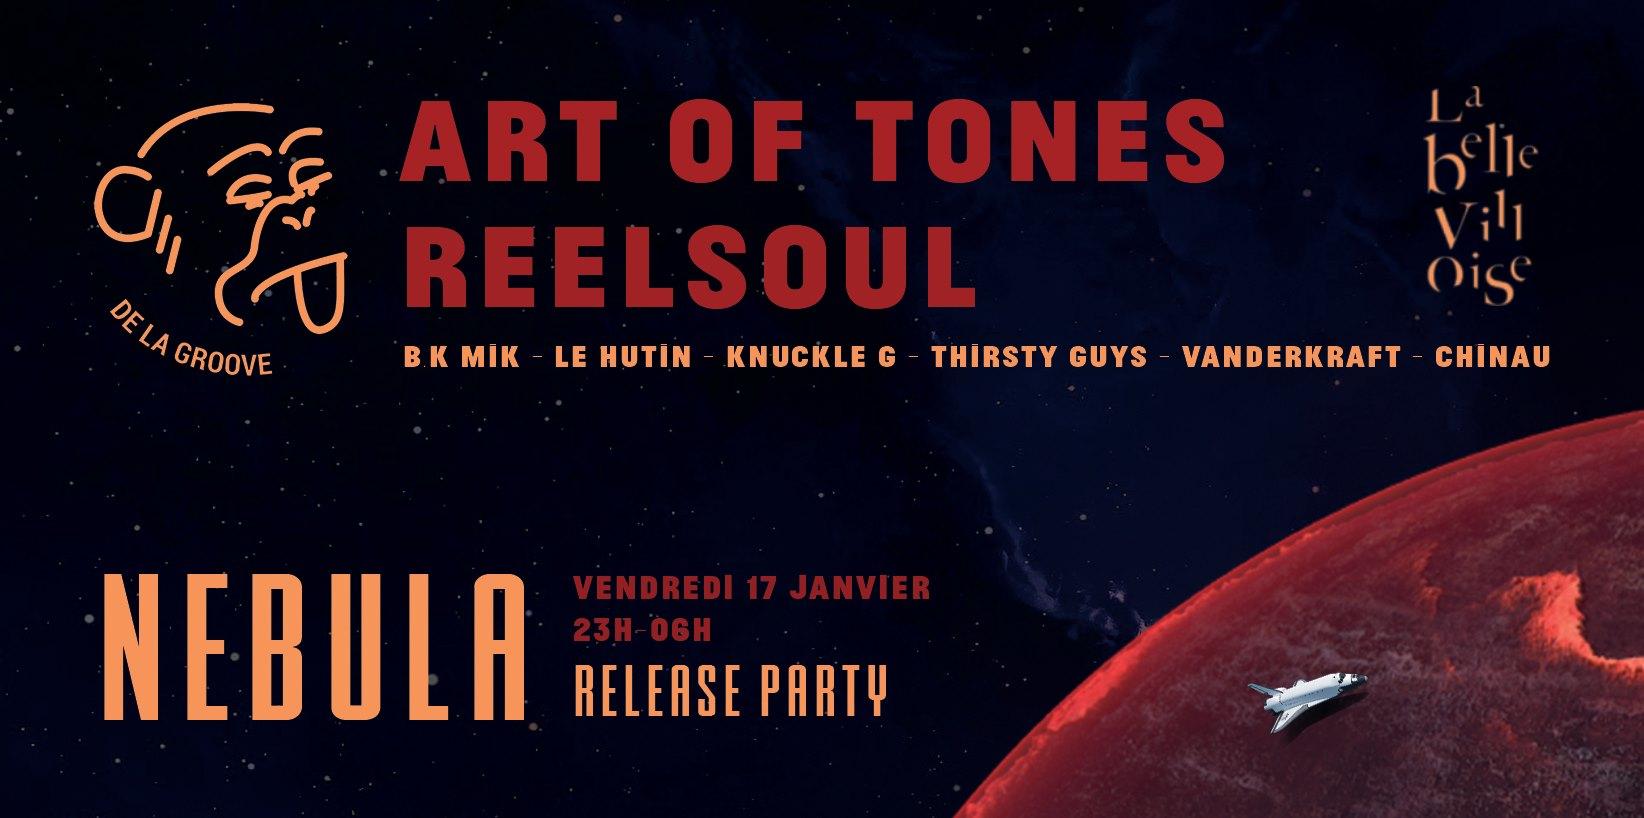 De La Groove x Art Of Tones x Reelsoul - Nebula Release Party